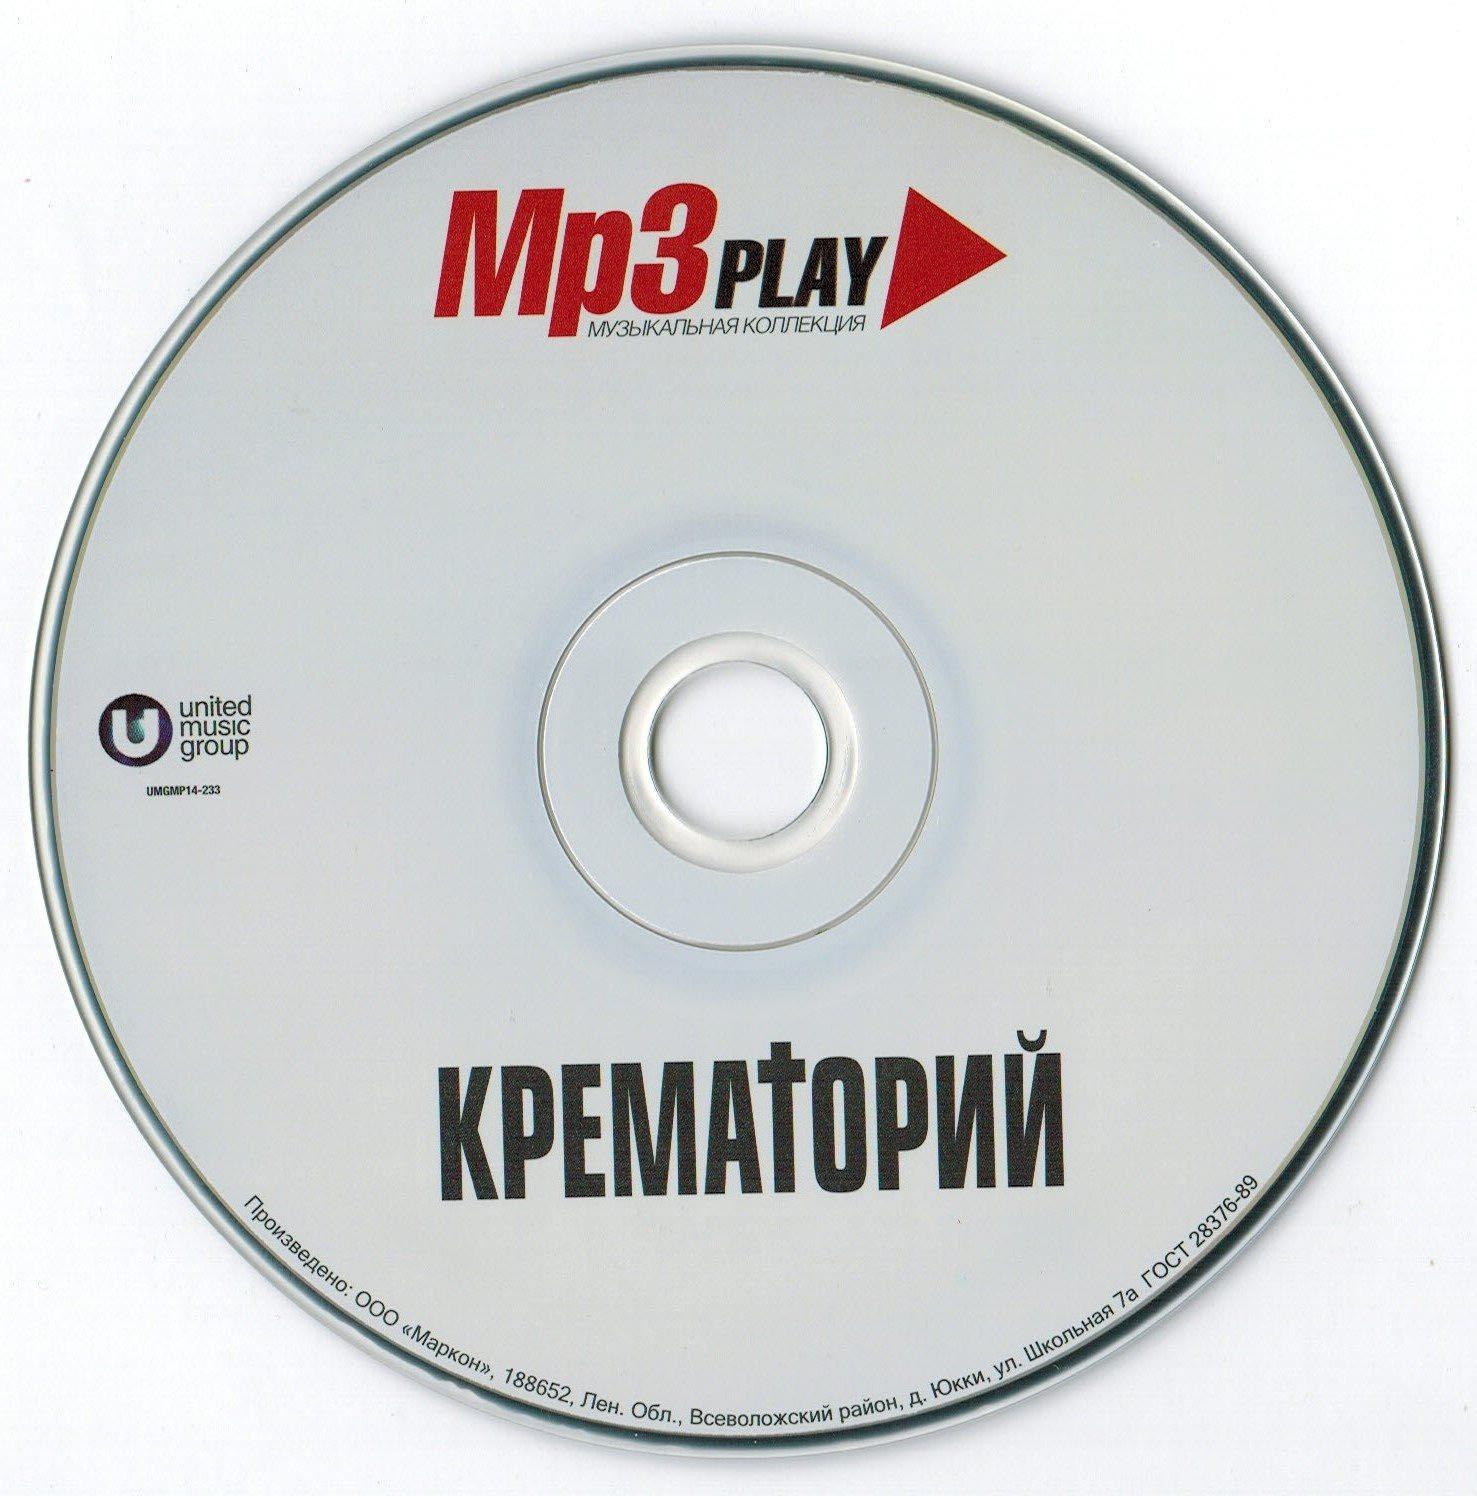 http://i5.imageban.ru/out/2014/10/22/12c4d82920bb6eb07e713b353f850ae0.jpg